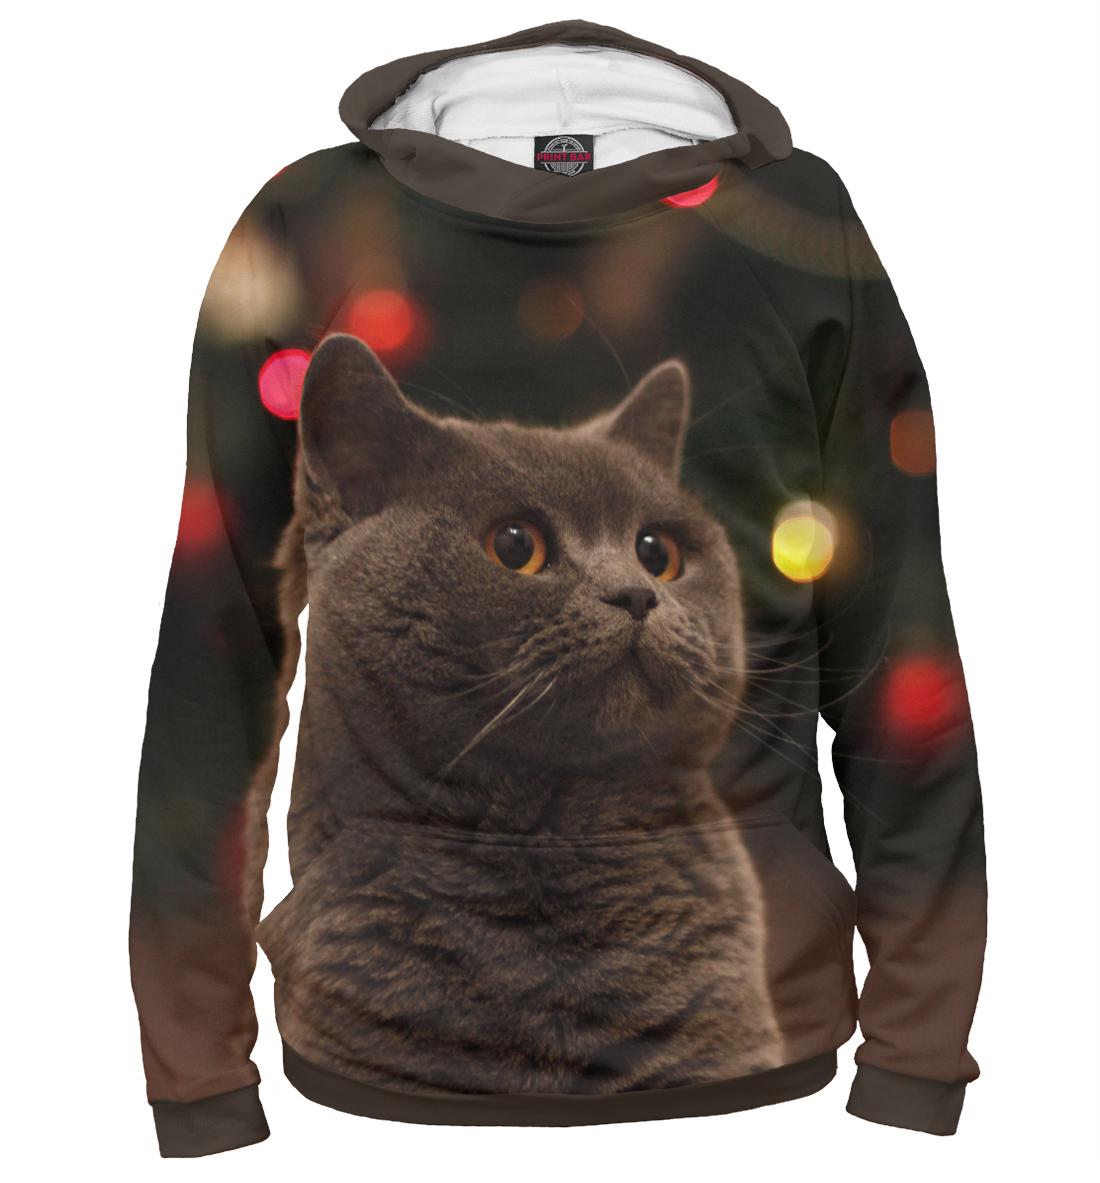 Фото - Новогодний кот новогодний кот